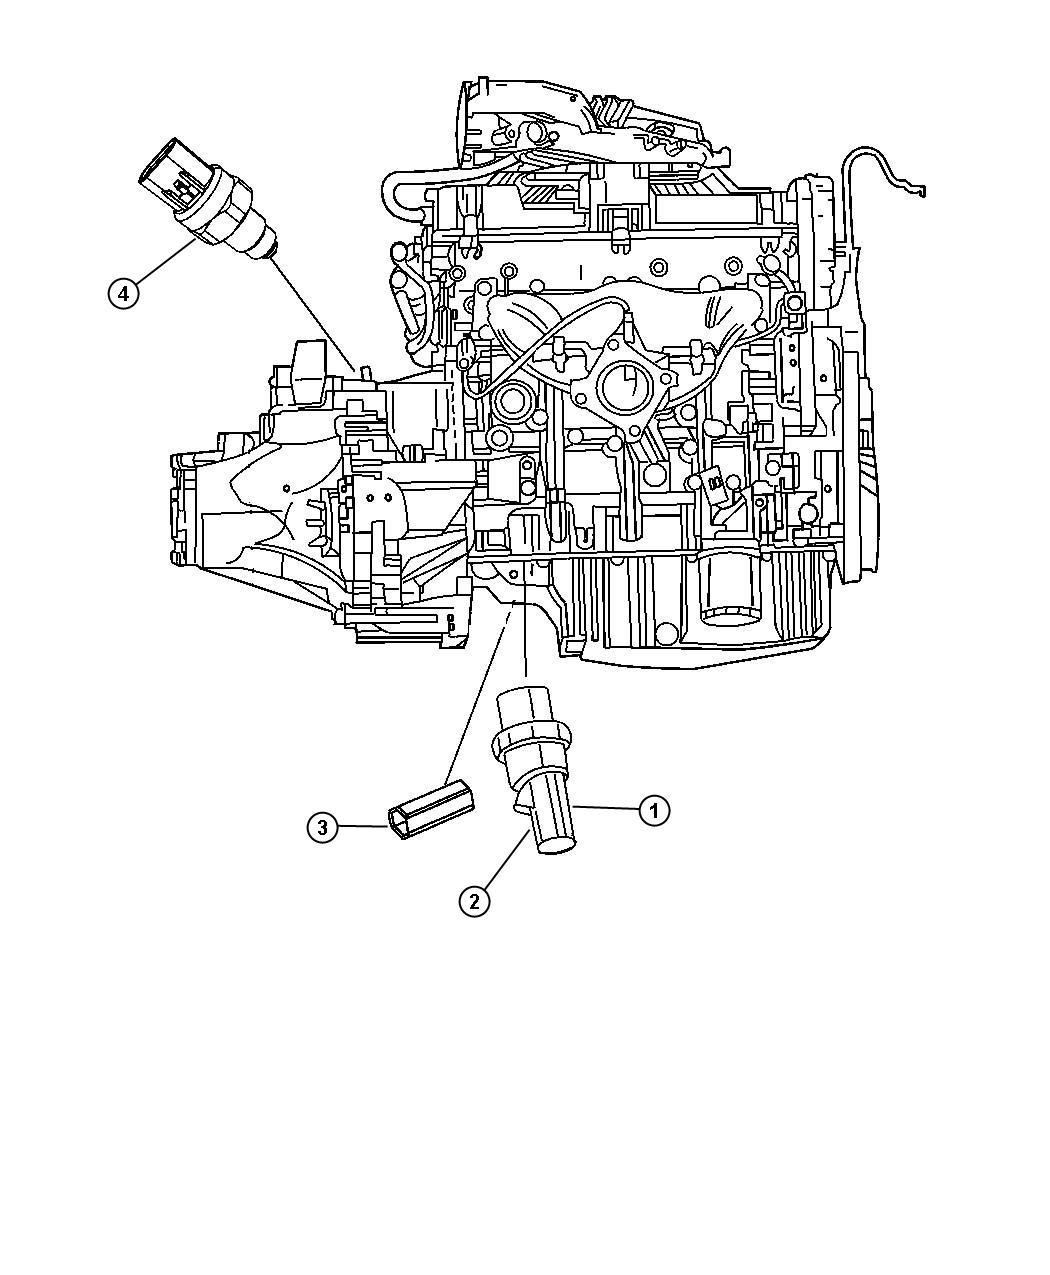 Chrysler Sebring Shield Wiring Powertrain Engine